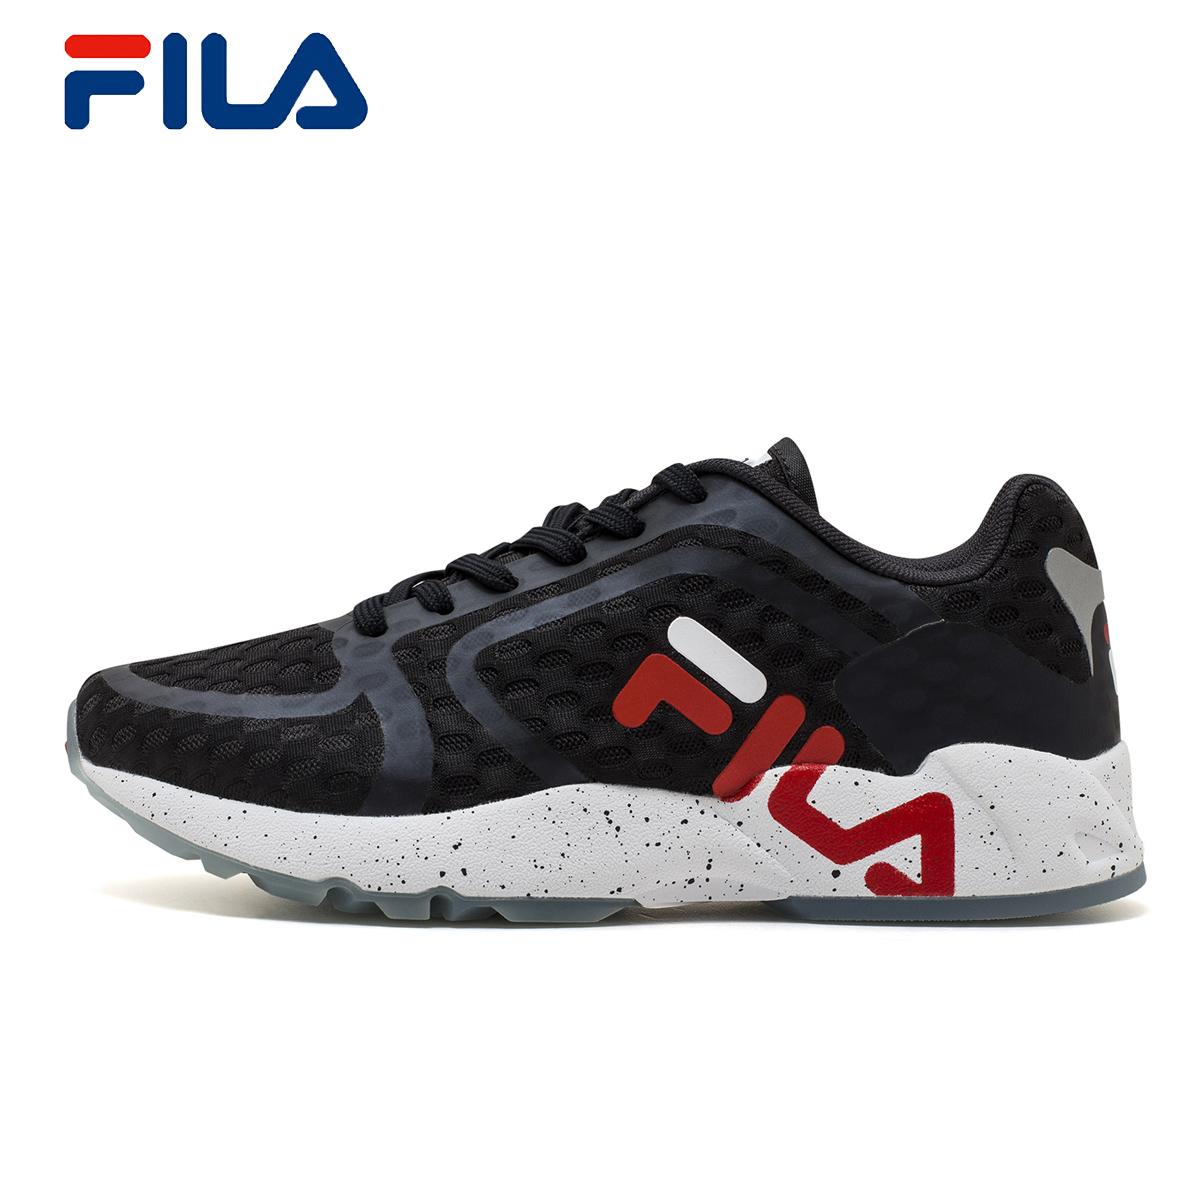 fila womens sneakers. fila women\u0027s shoes 2017 new retro running net surface breathable sneakers female womens